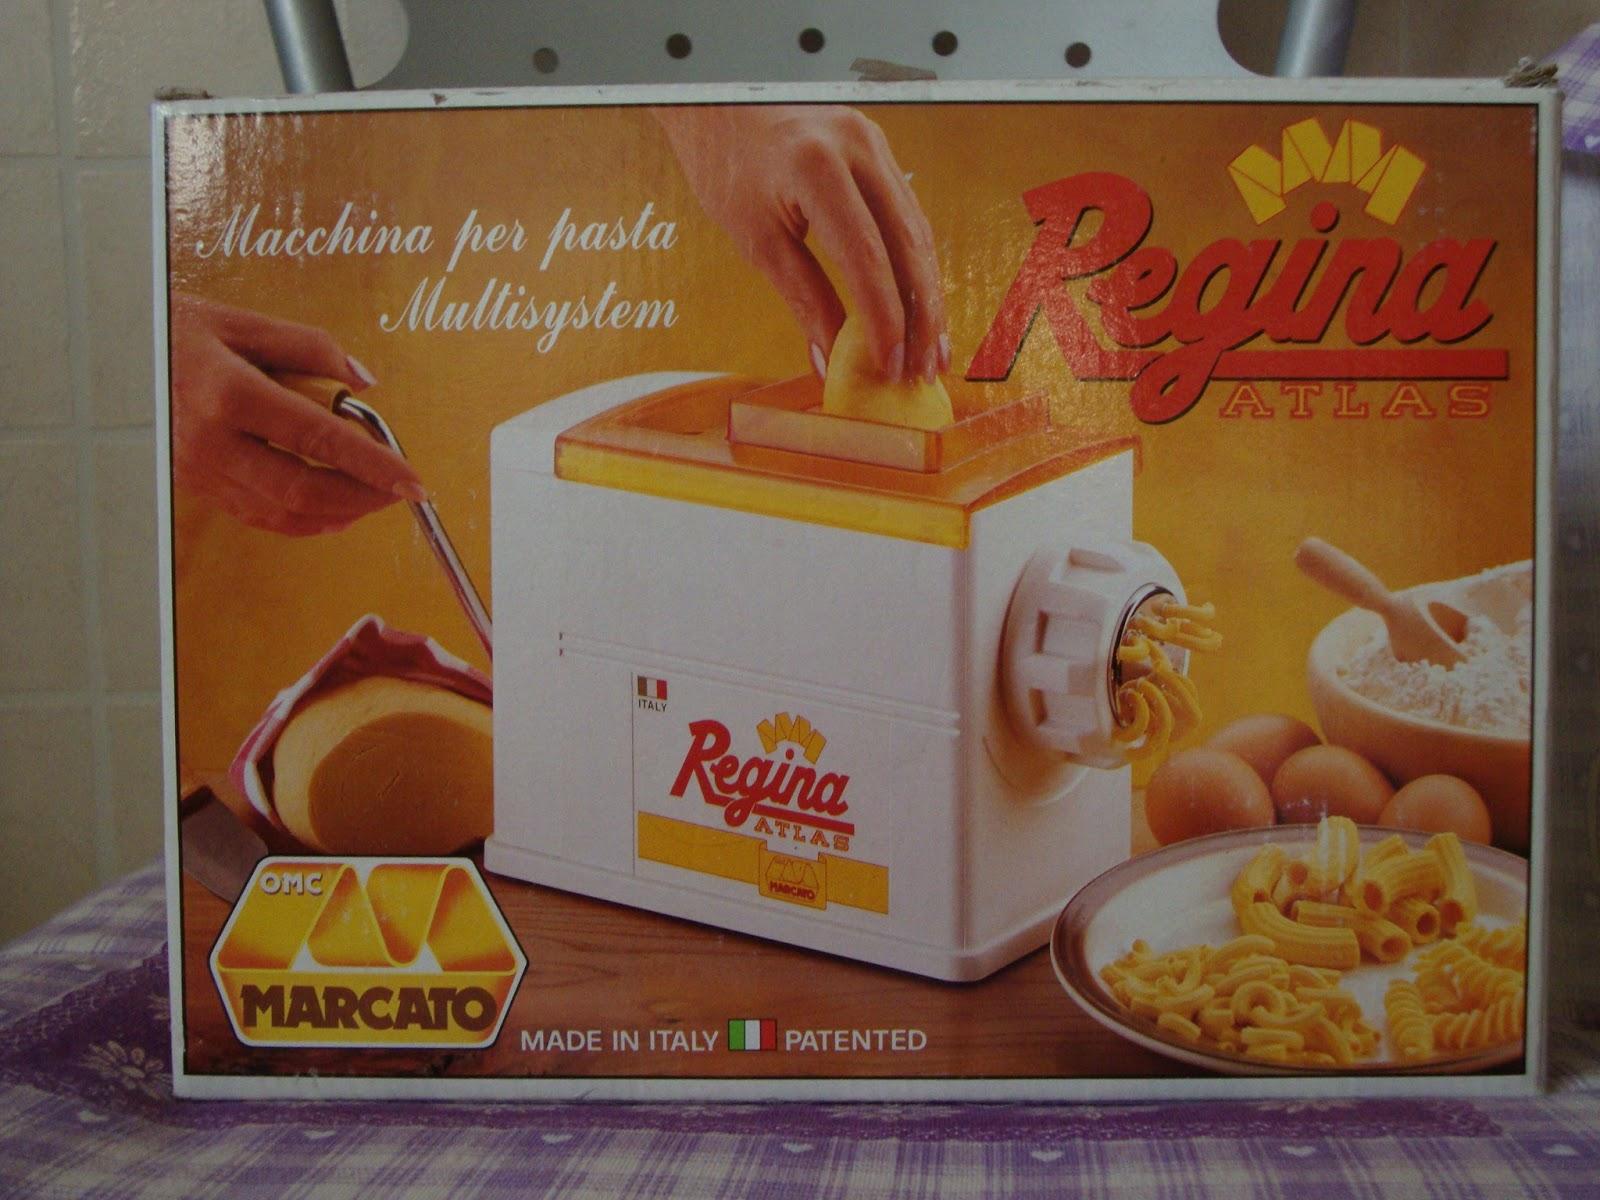 Gli hobbies di charlotte pasta fatta in casa - Pasta fatta in casa macchina ...